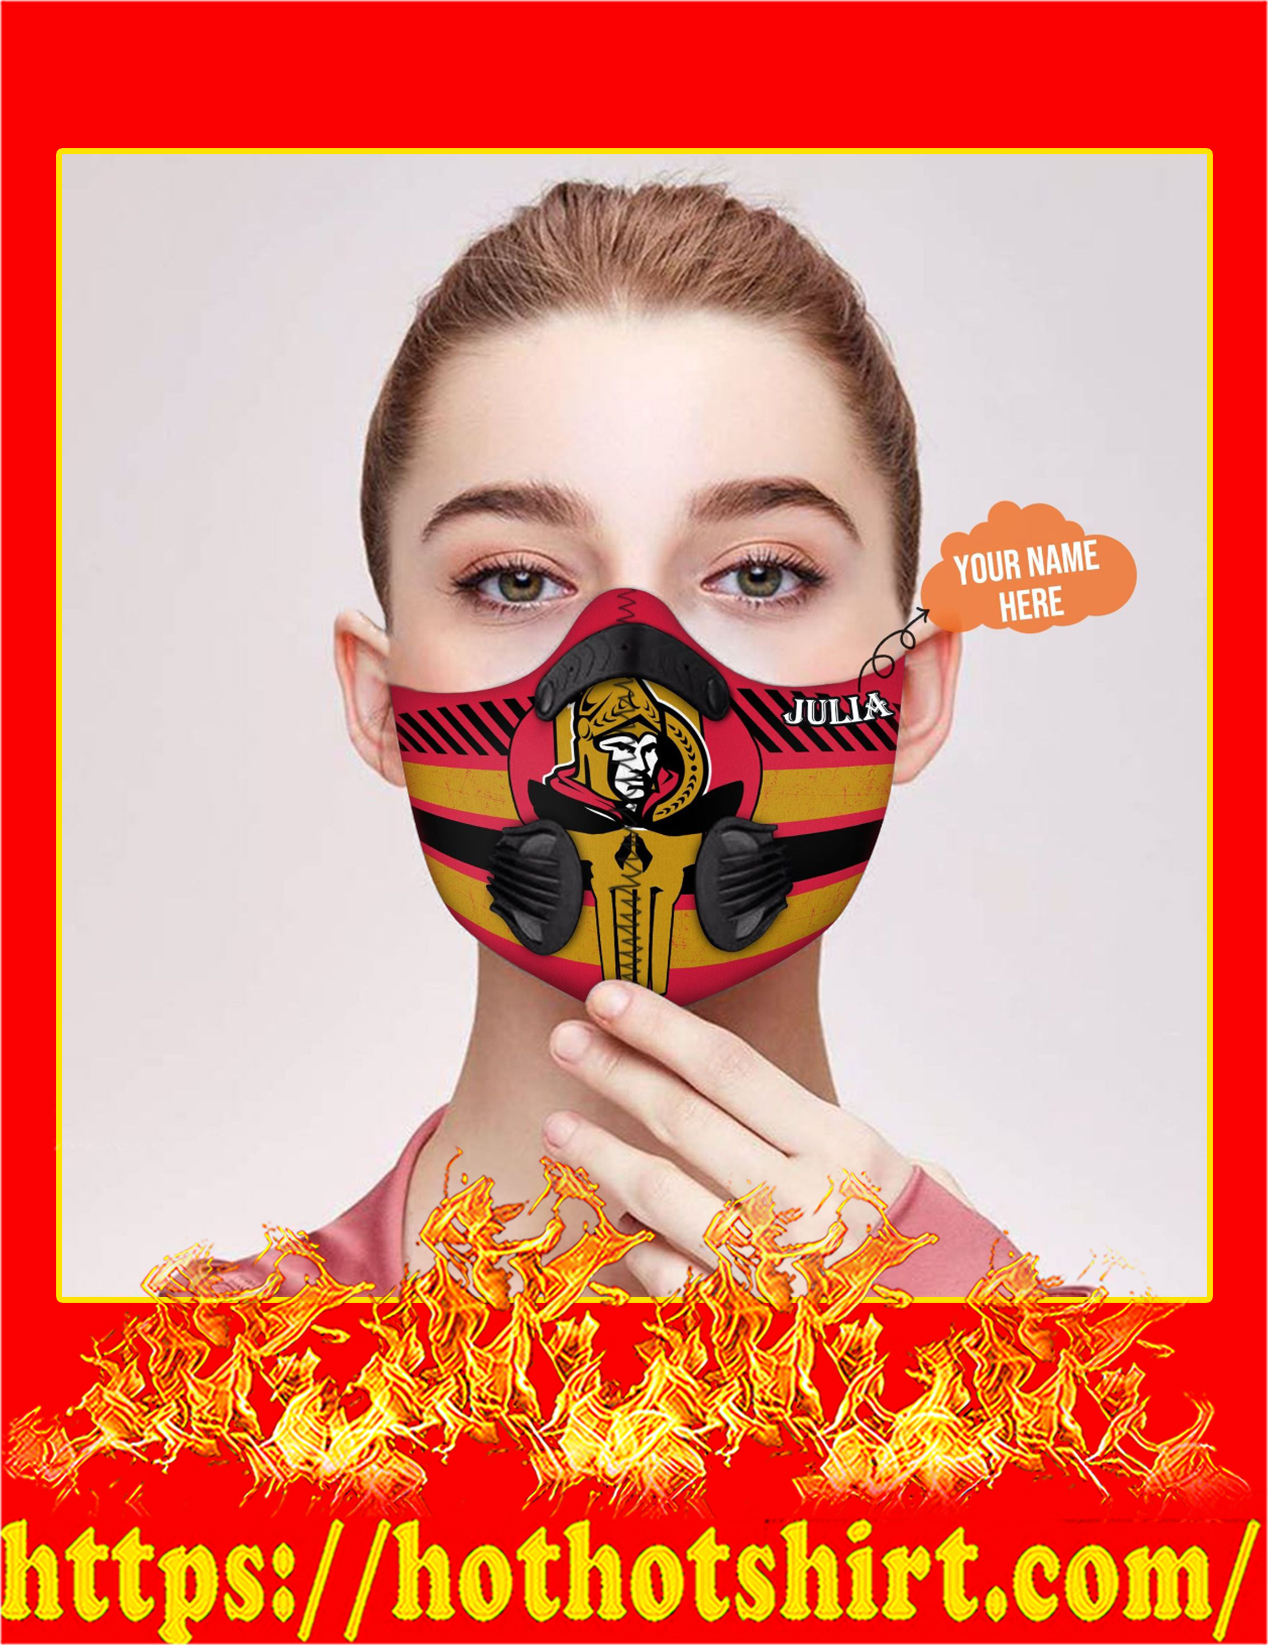 Personalized custom name Ottawa senators punisher skull filter face mask - detail